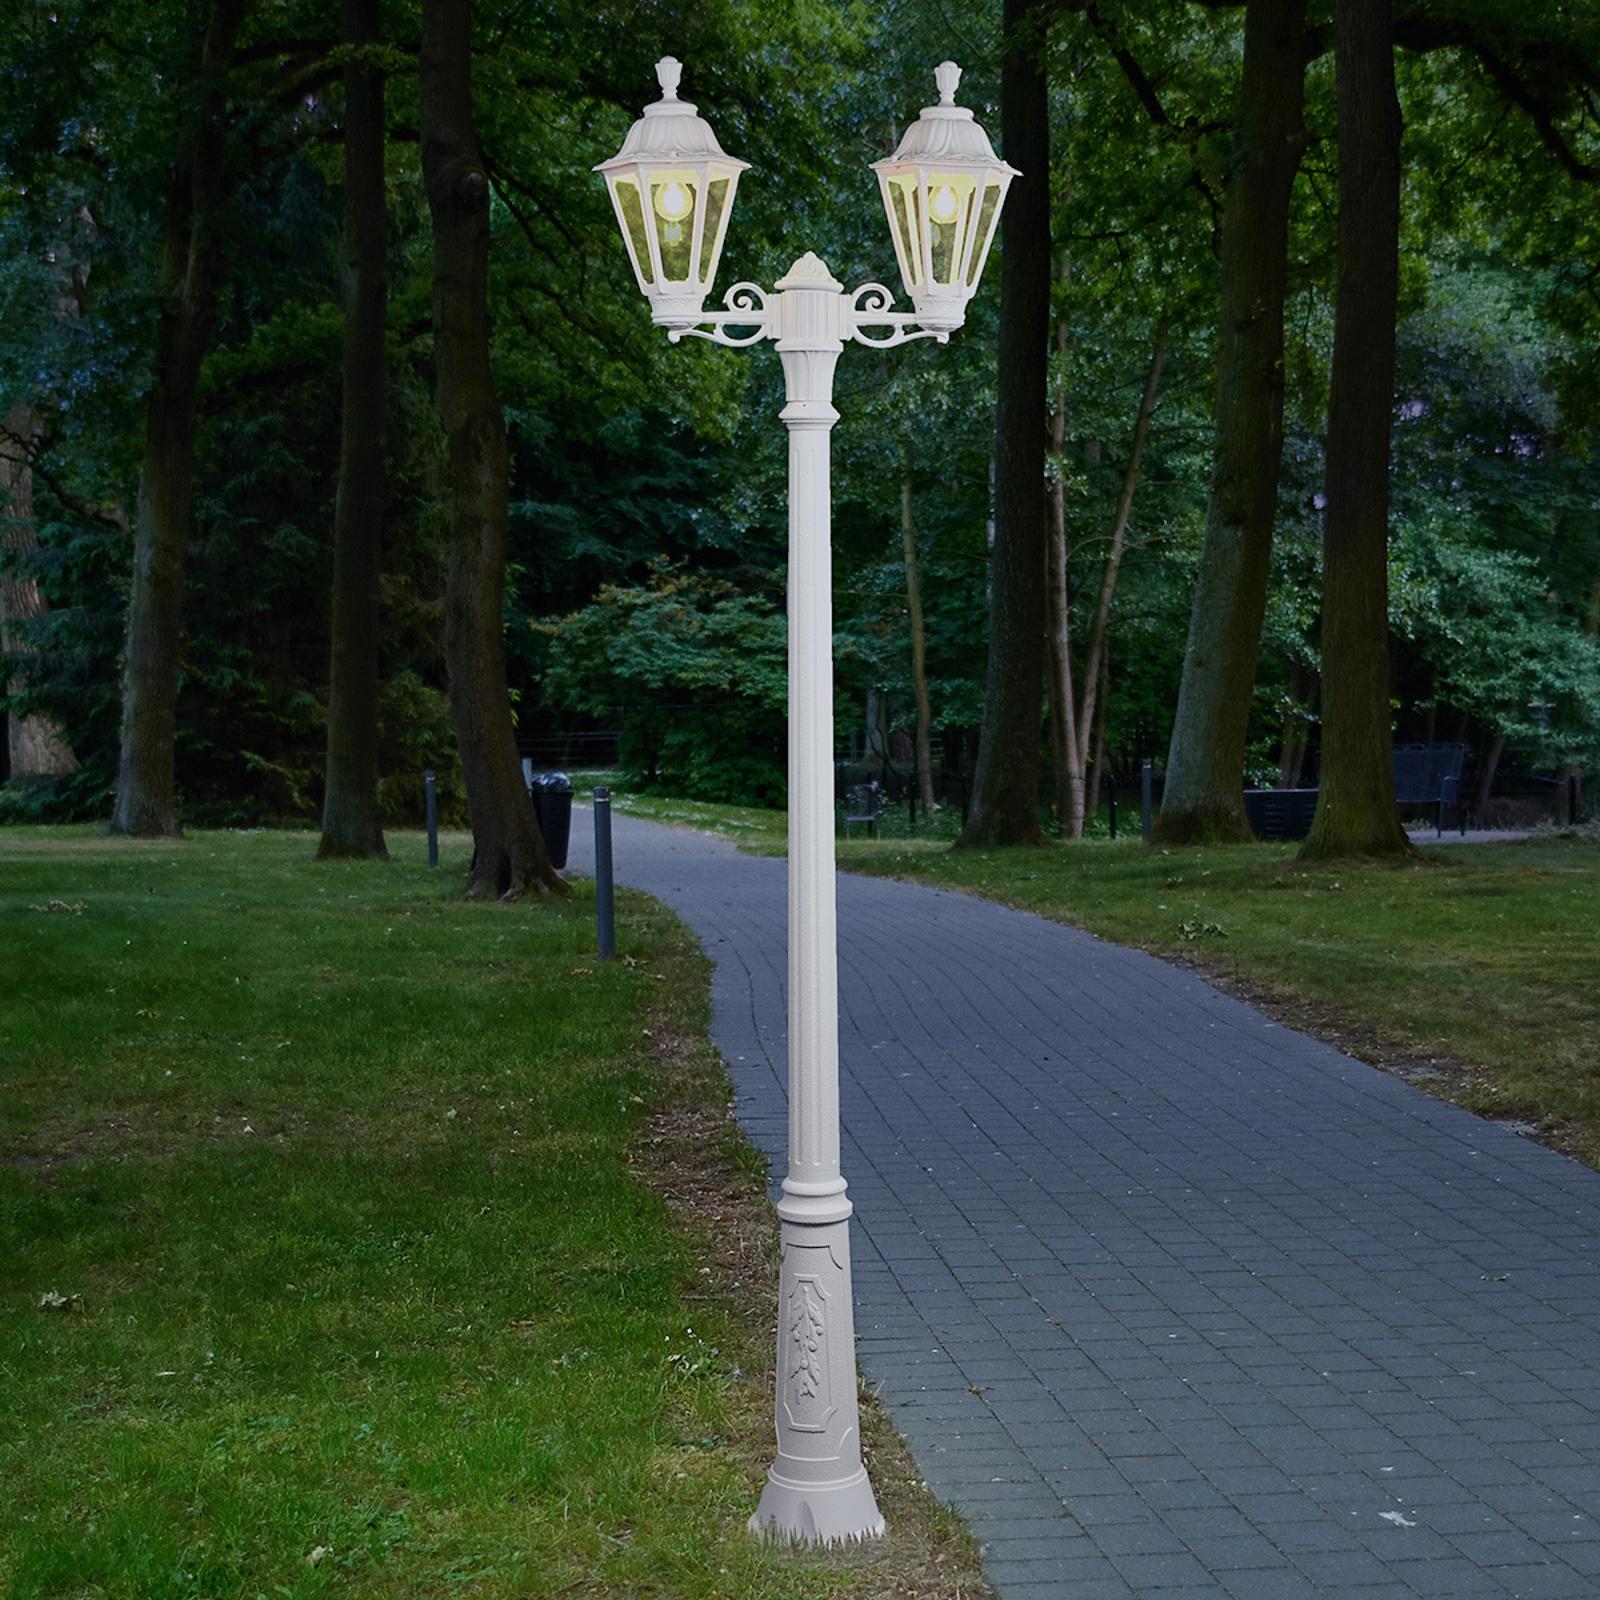 LED-Mastleuchte Artu Rut 2-flammig E27 weiß